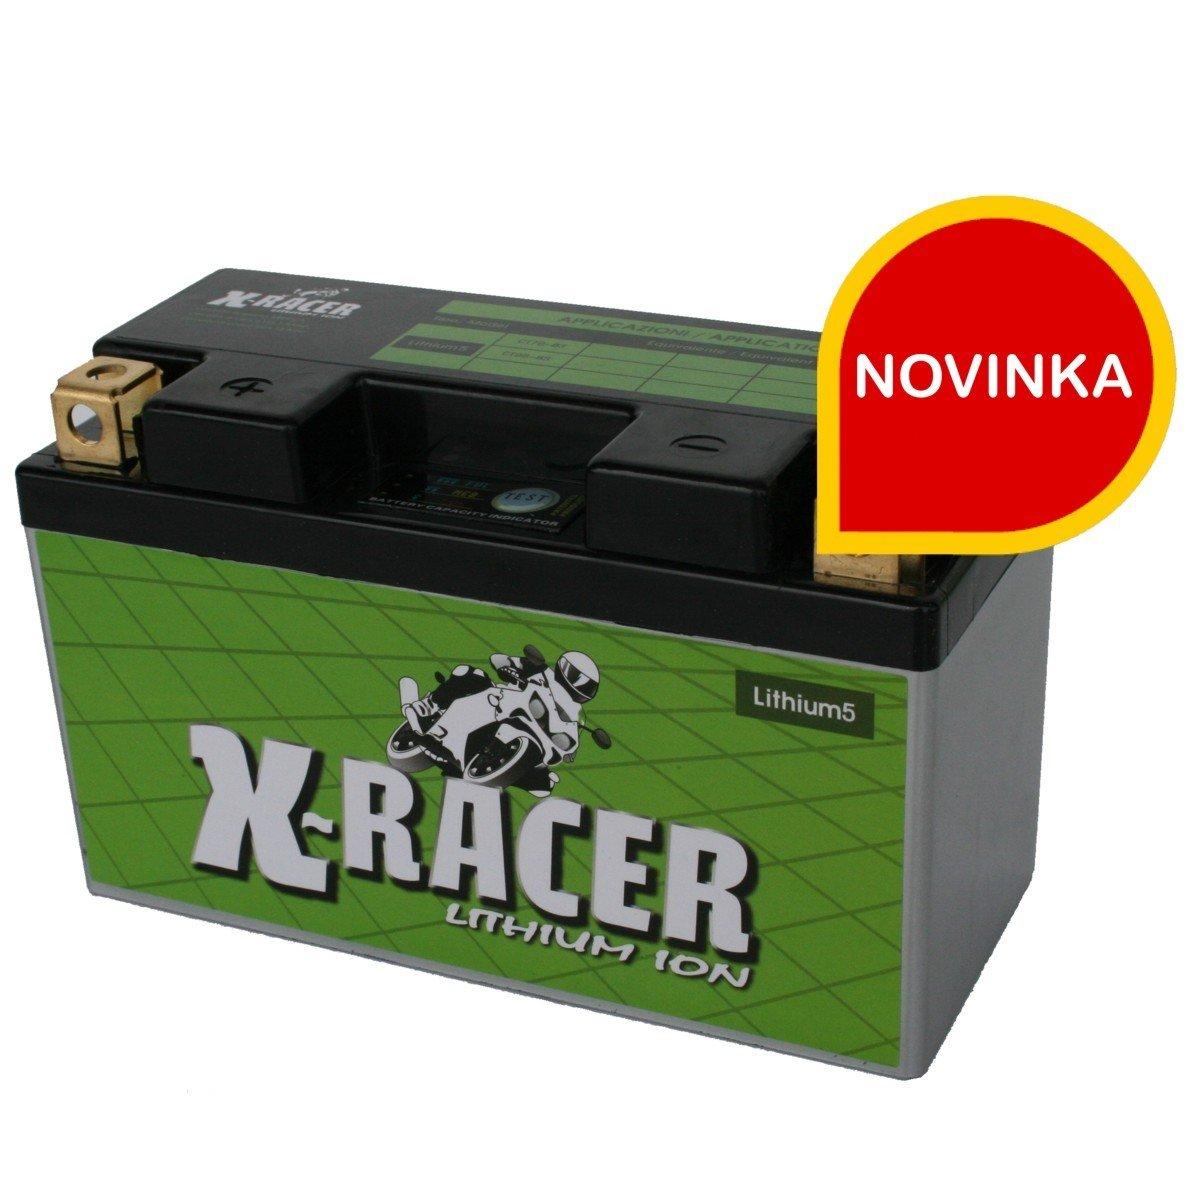 X-RACER Lithium5